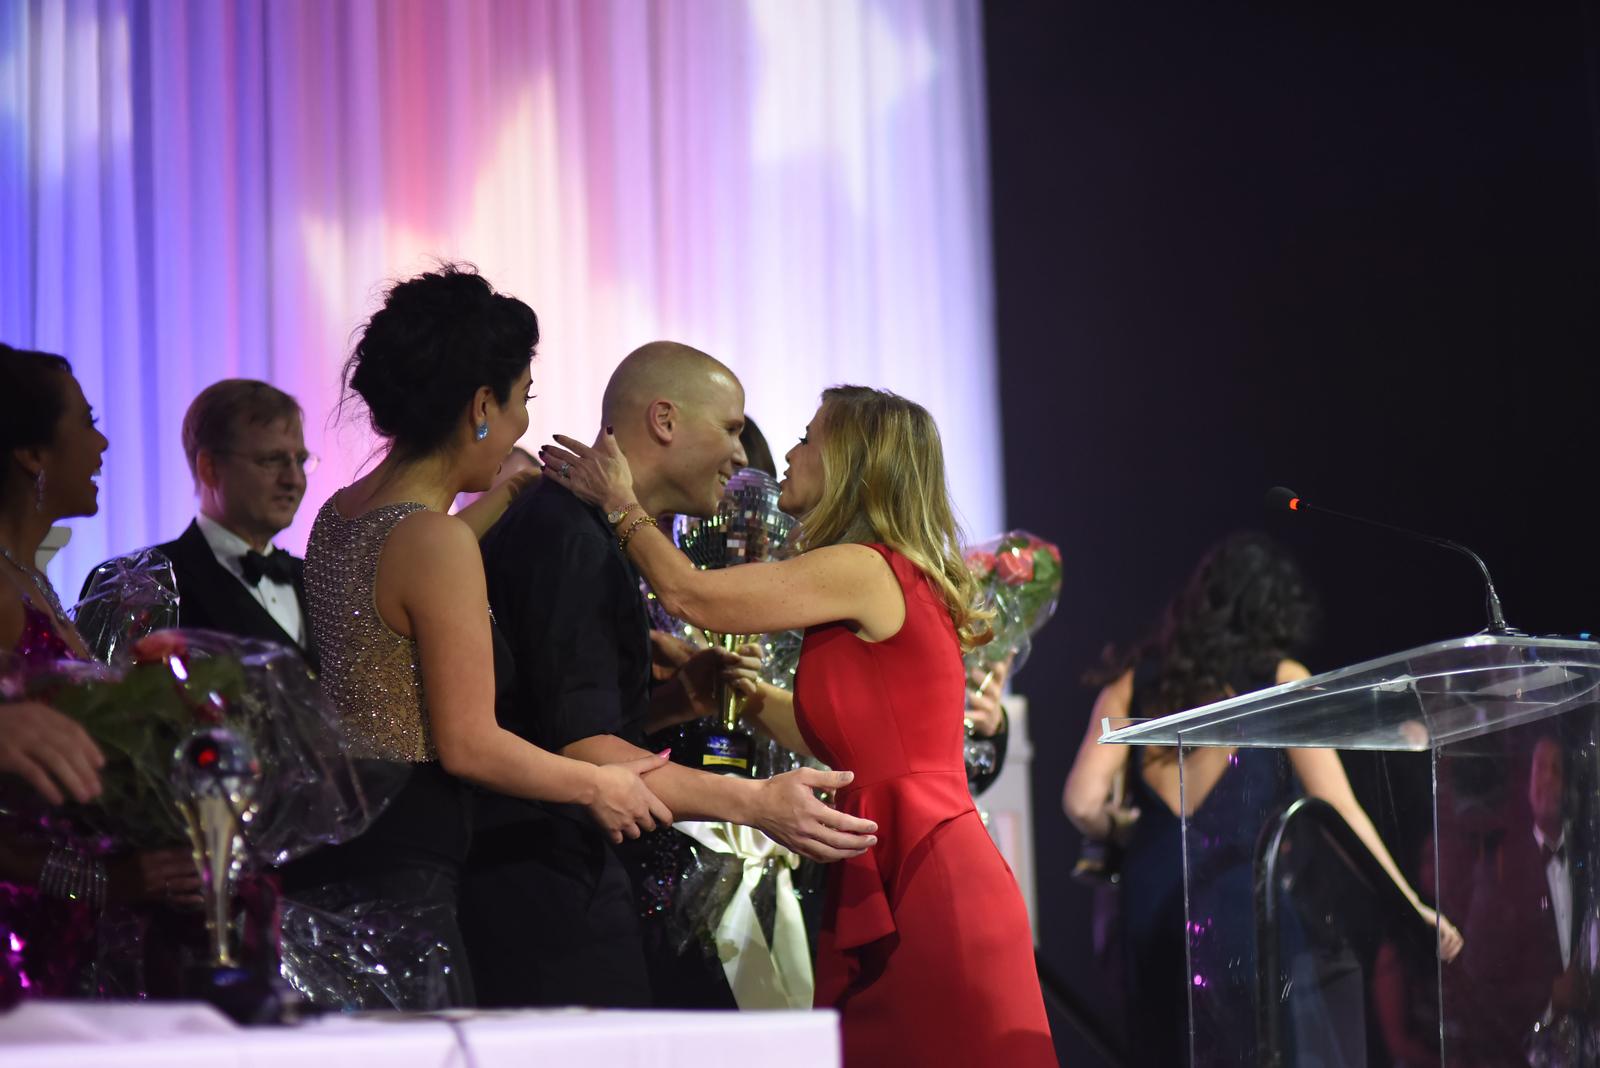 Karina Vidal, Paul Ashe & Maria Coakley David. November 11, 2017. DC's Dancing Stars Gala. Amanda Warden.